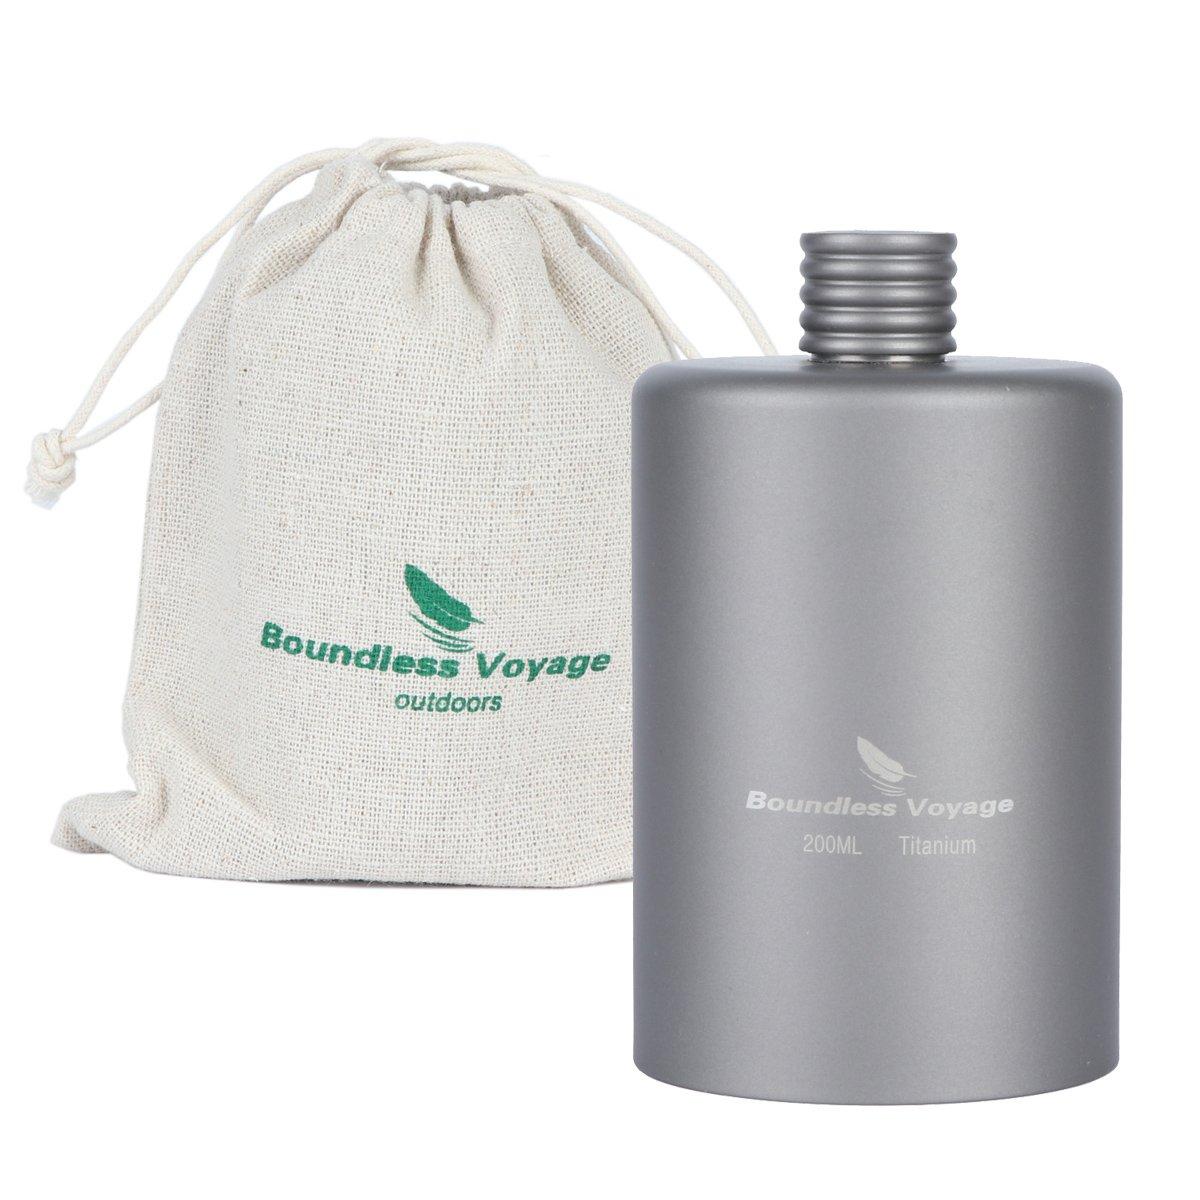 iBasingo 200ml Titanium Pocket Flagon Camping Portable Alcohol Bottle Drink Sports Outdoor Hip Flask Picnic Wine Bottle